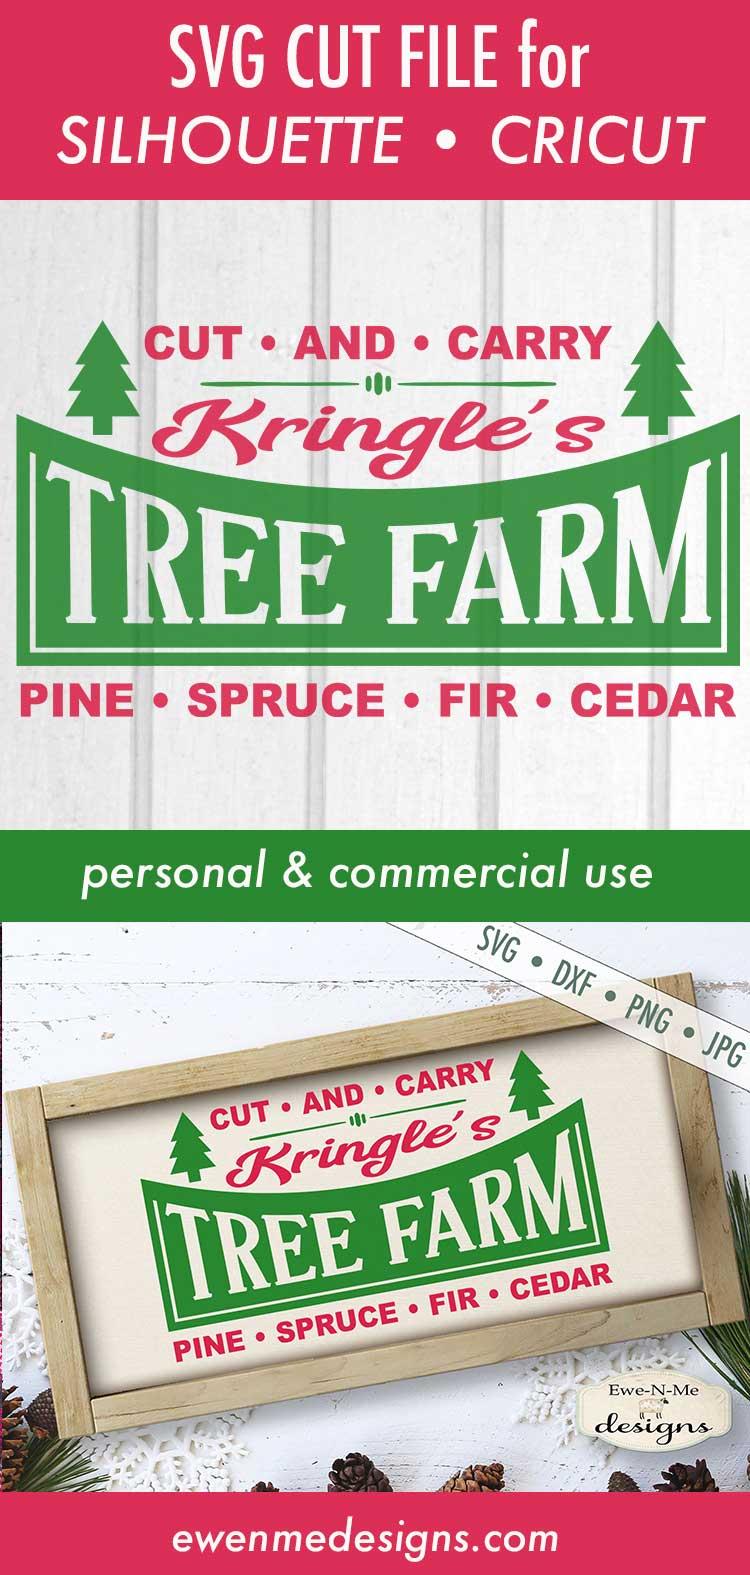 Kringles Tree Farm - Christmas - Retro Christmas - SVG DXF example image 3